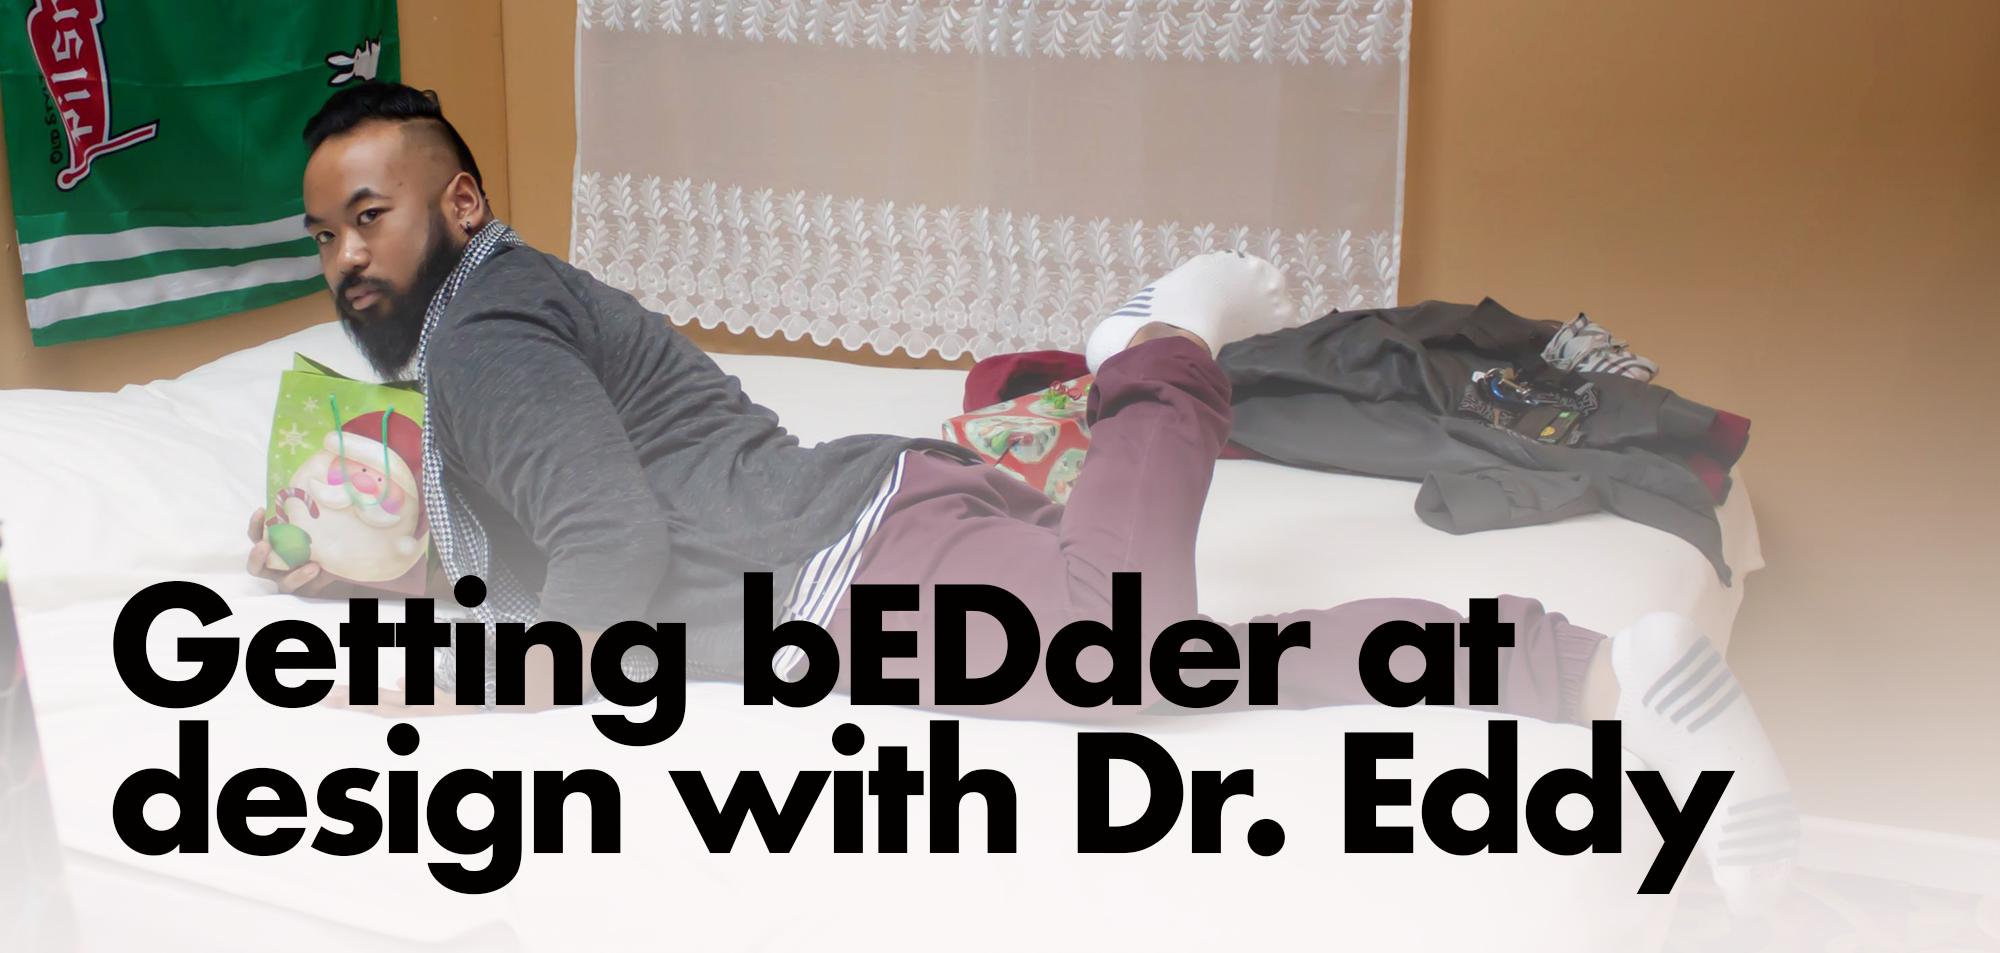 Design 801- getting bedder with Dr. Eddy